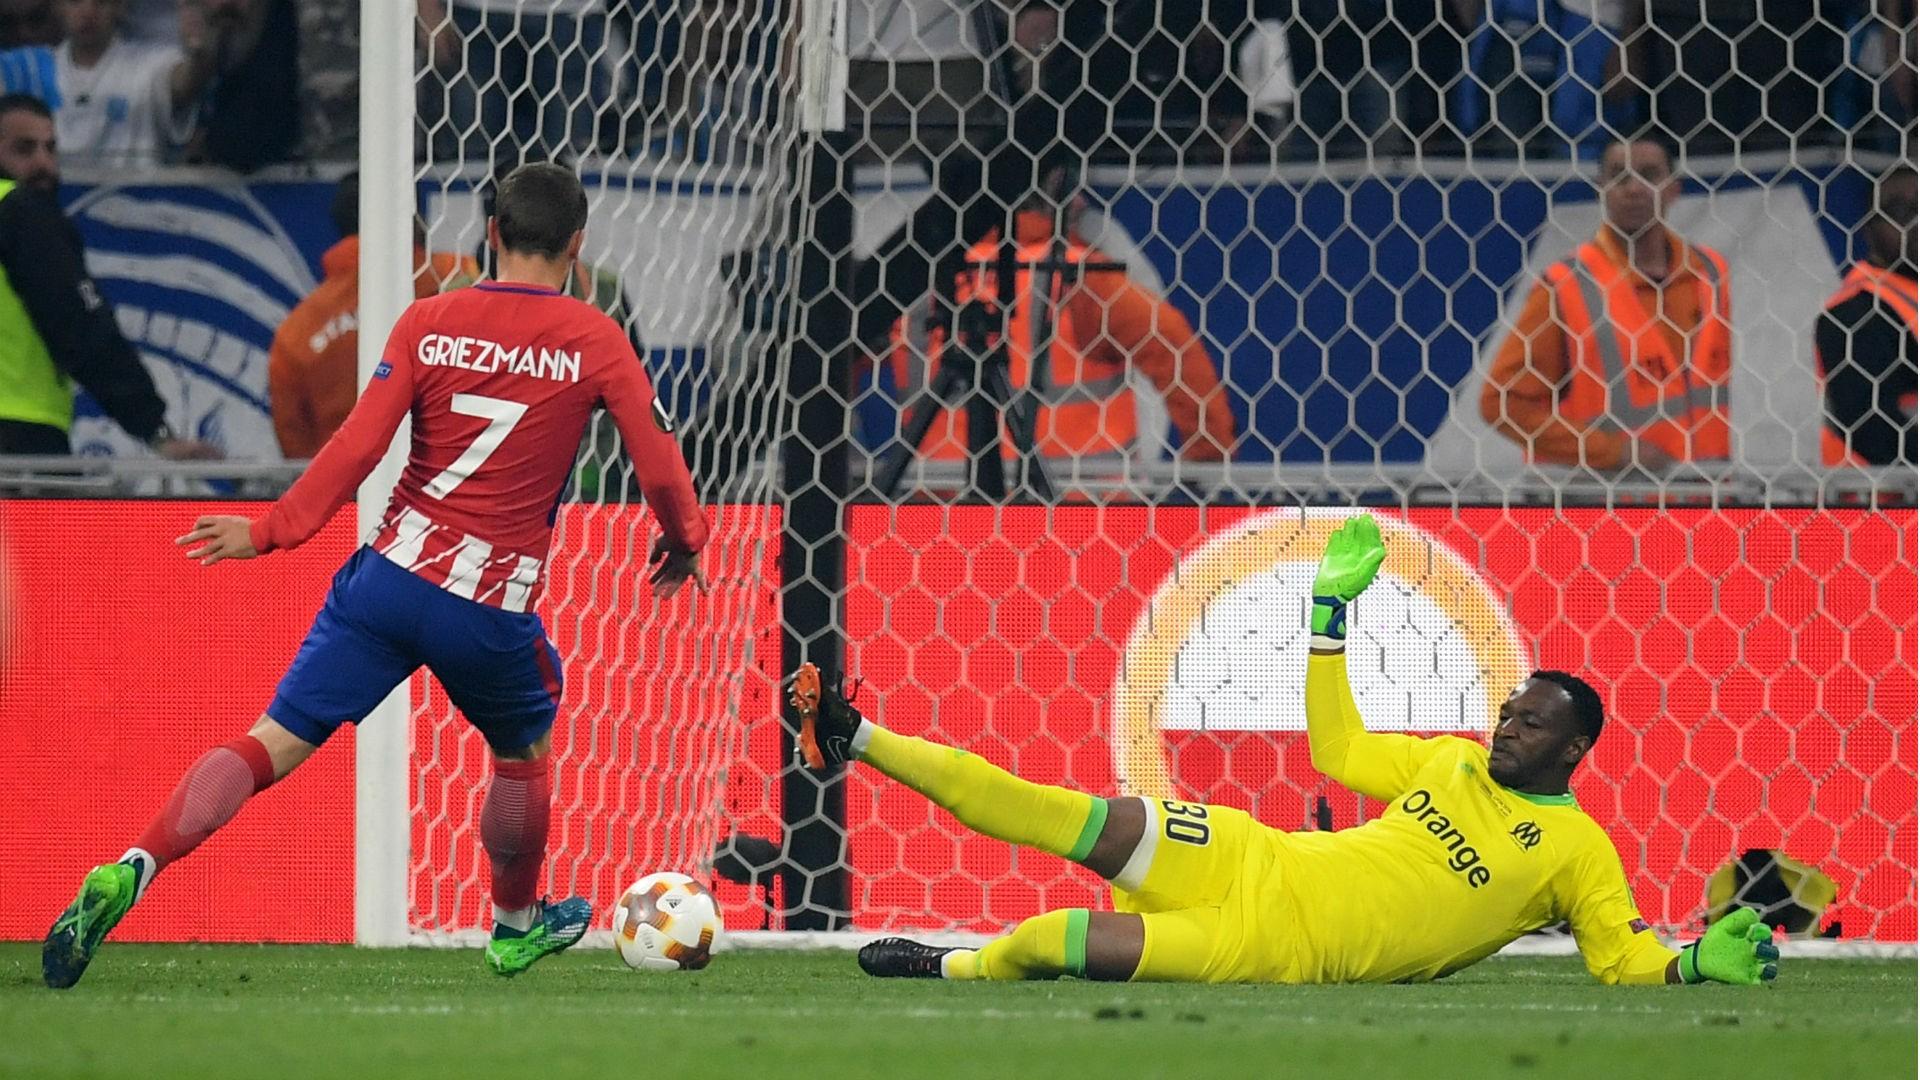 griezmann cropped 1kzieem15oqb71xv5obm9quork - VIDEO: Marseille 0-3 Atletico Madrid (UEFA Europa League) Highlights